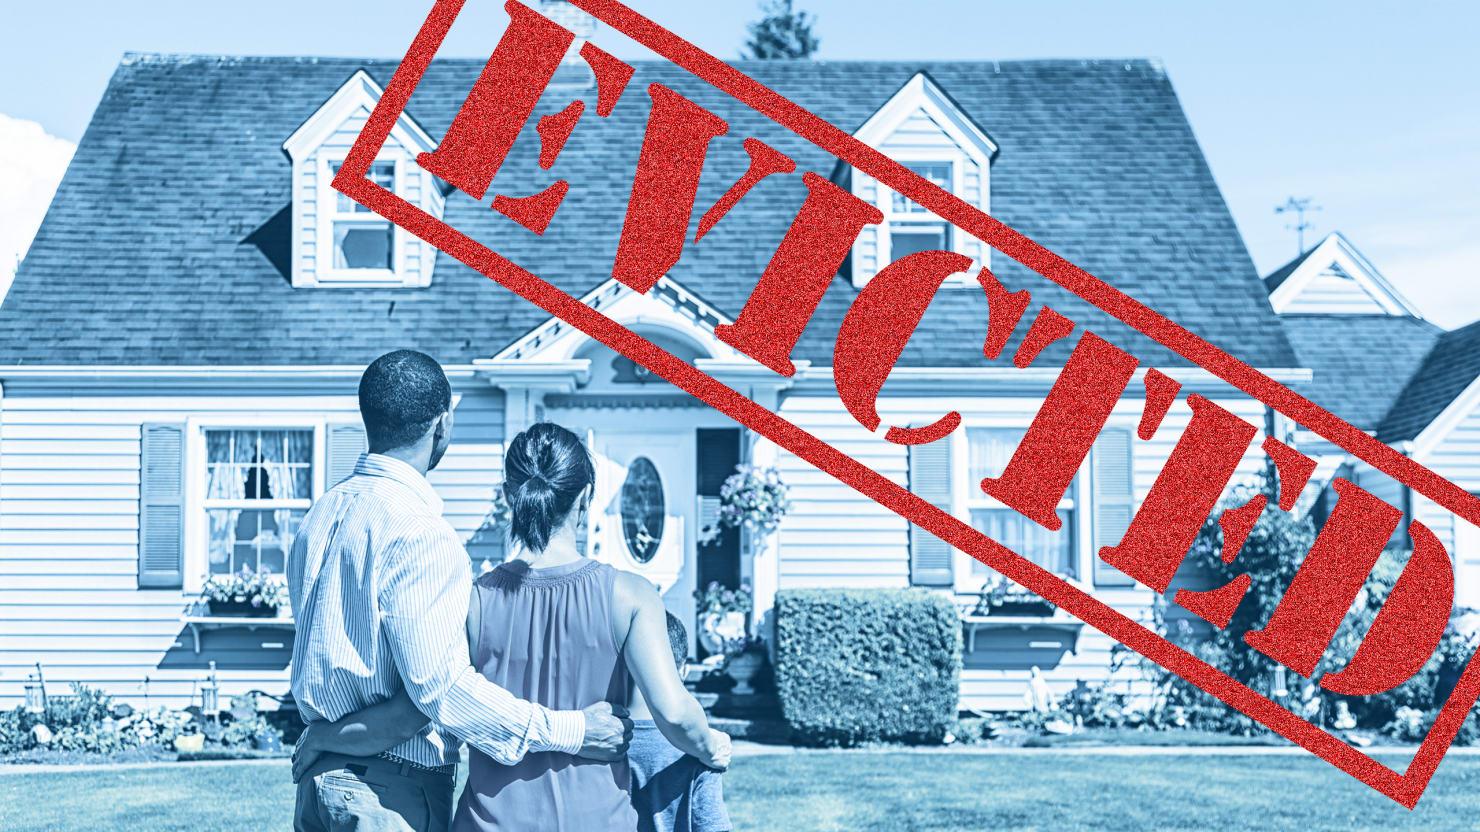 California Housing Boss to Build Luxury Condos Over Poor Tenants' Homes